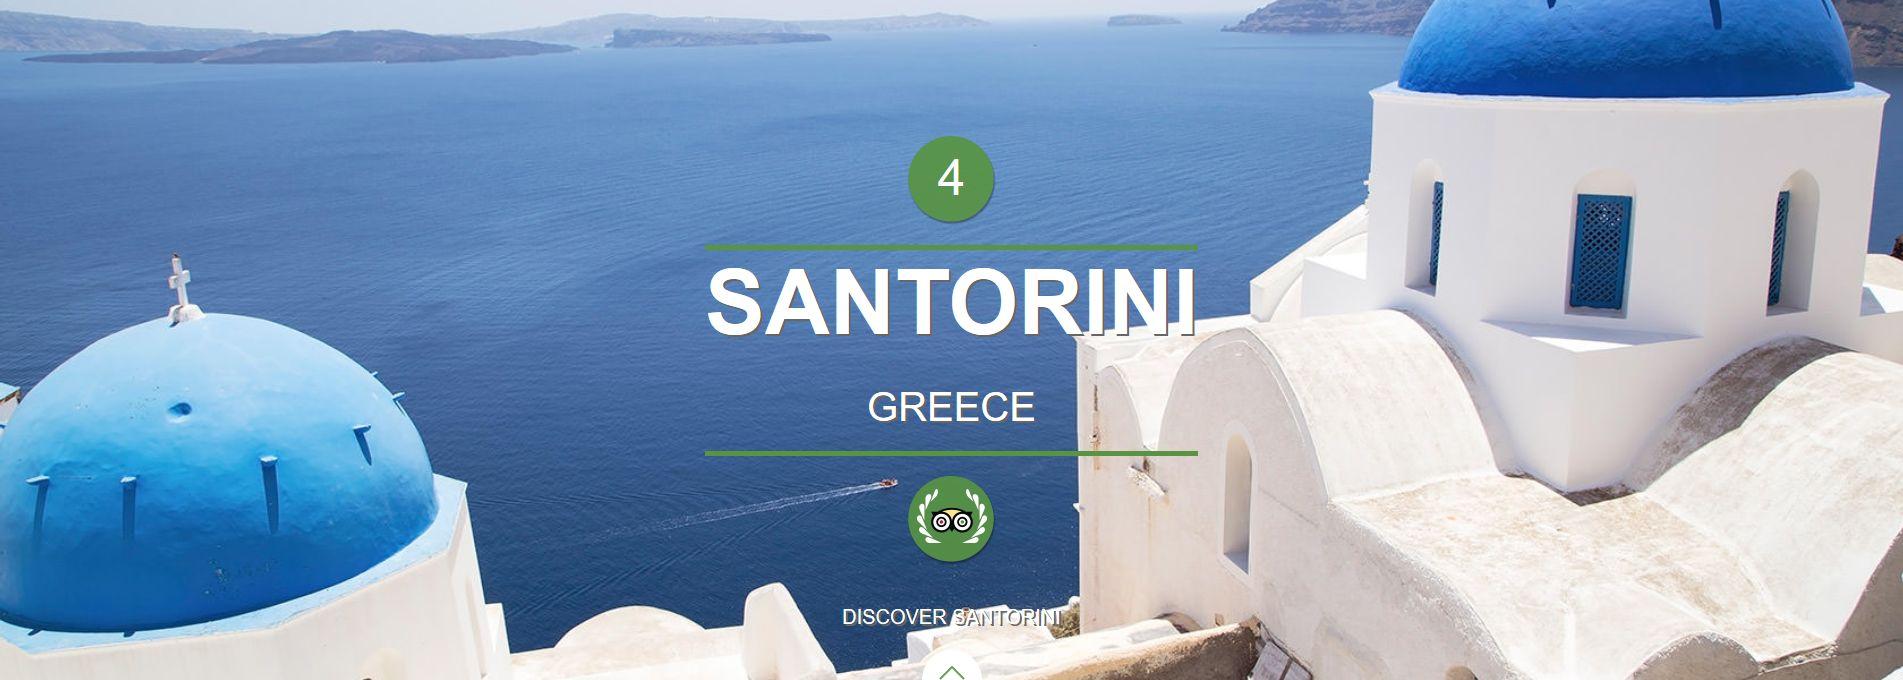 Santorini nominated as #4 World Island and #1 Europe Island @ 2015 TripAdvisor Traveler's Choice